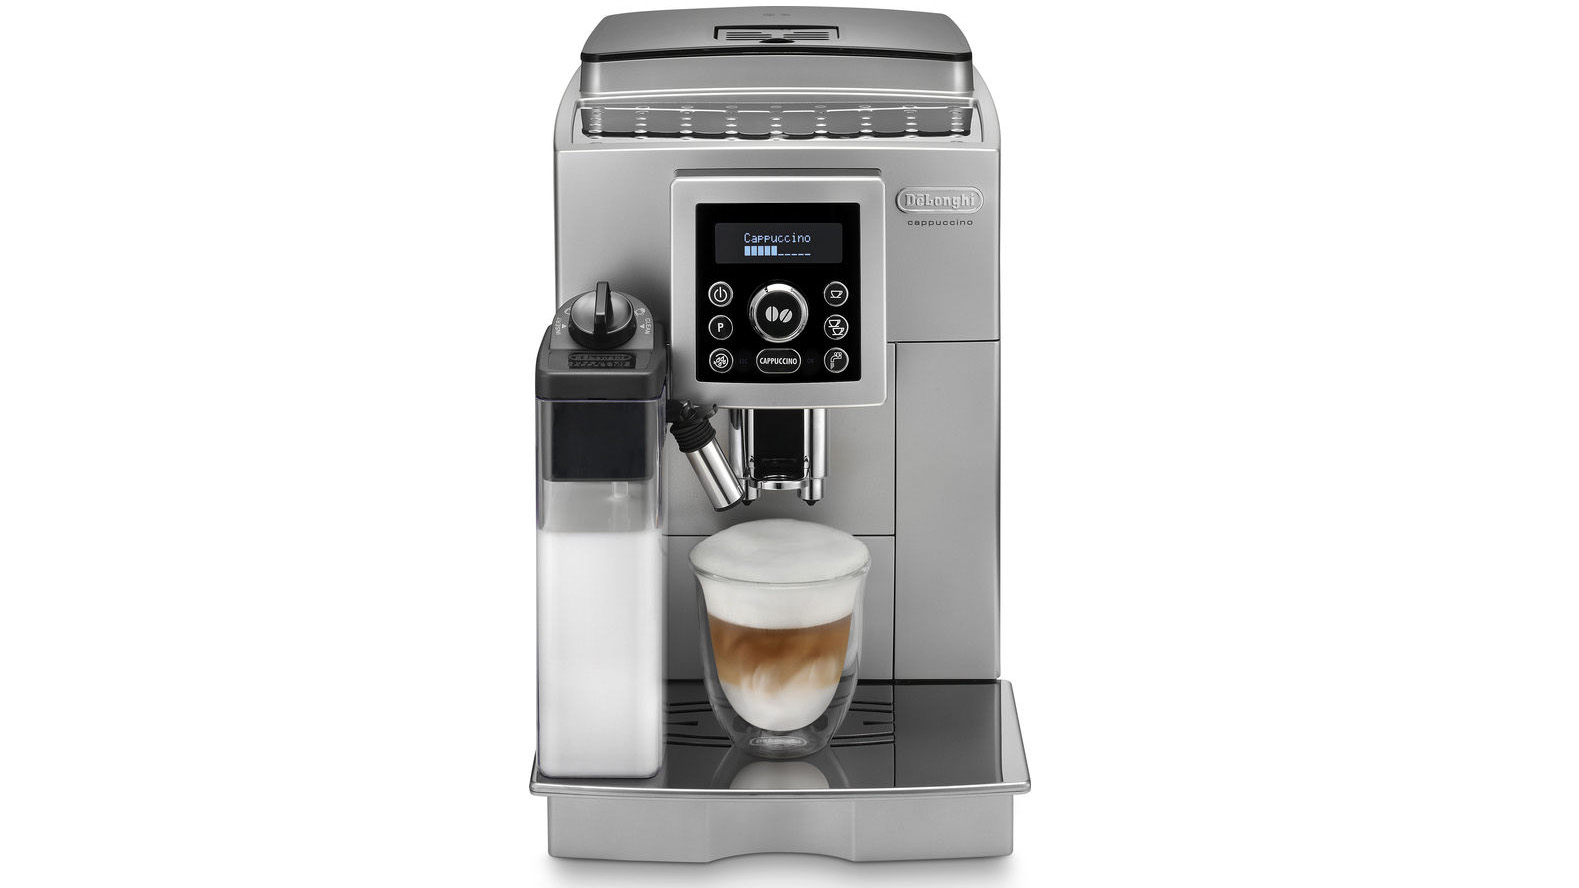 Should I buy a De'Longhi coffee machine